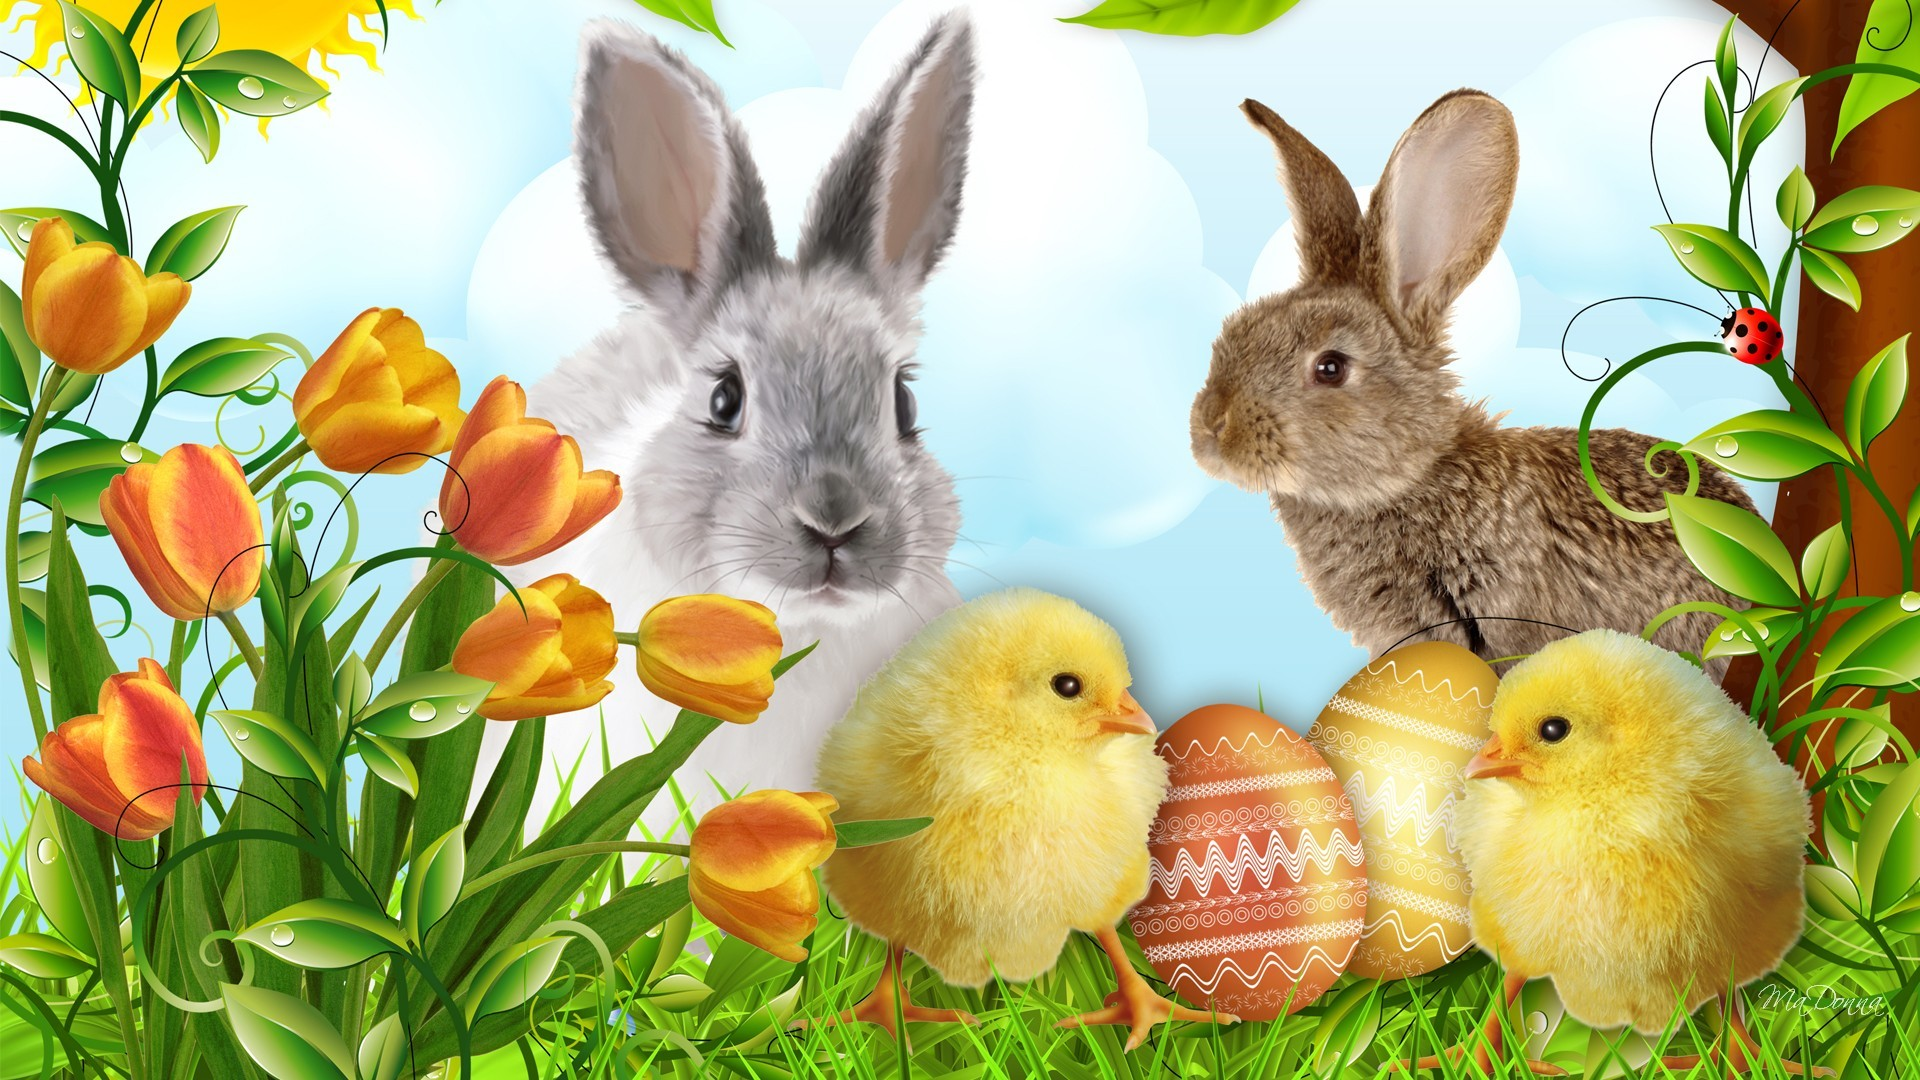 Happy Easter Desktop Wallpaper HD (10)